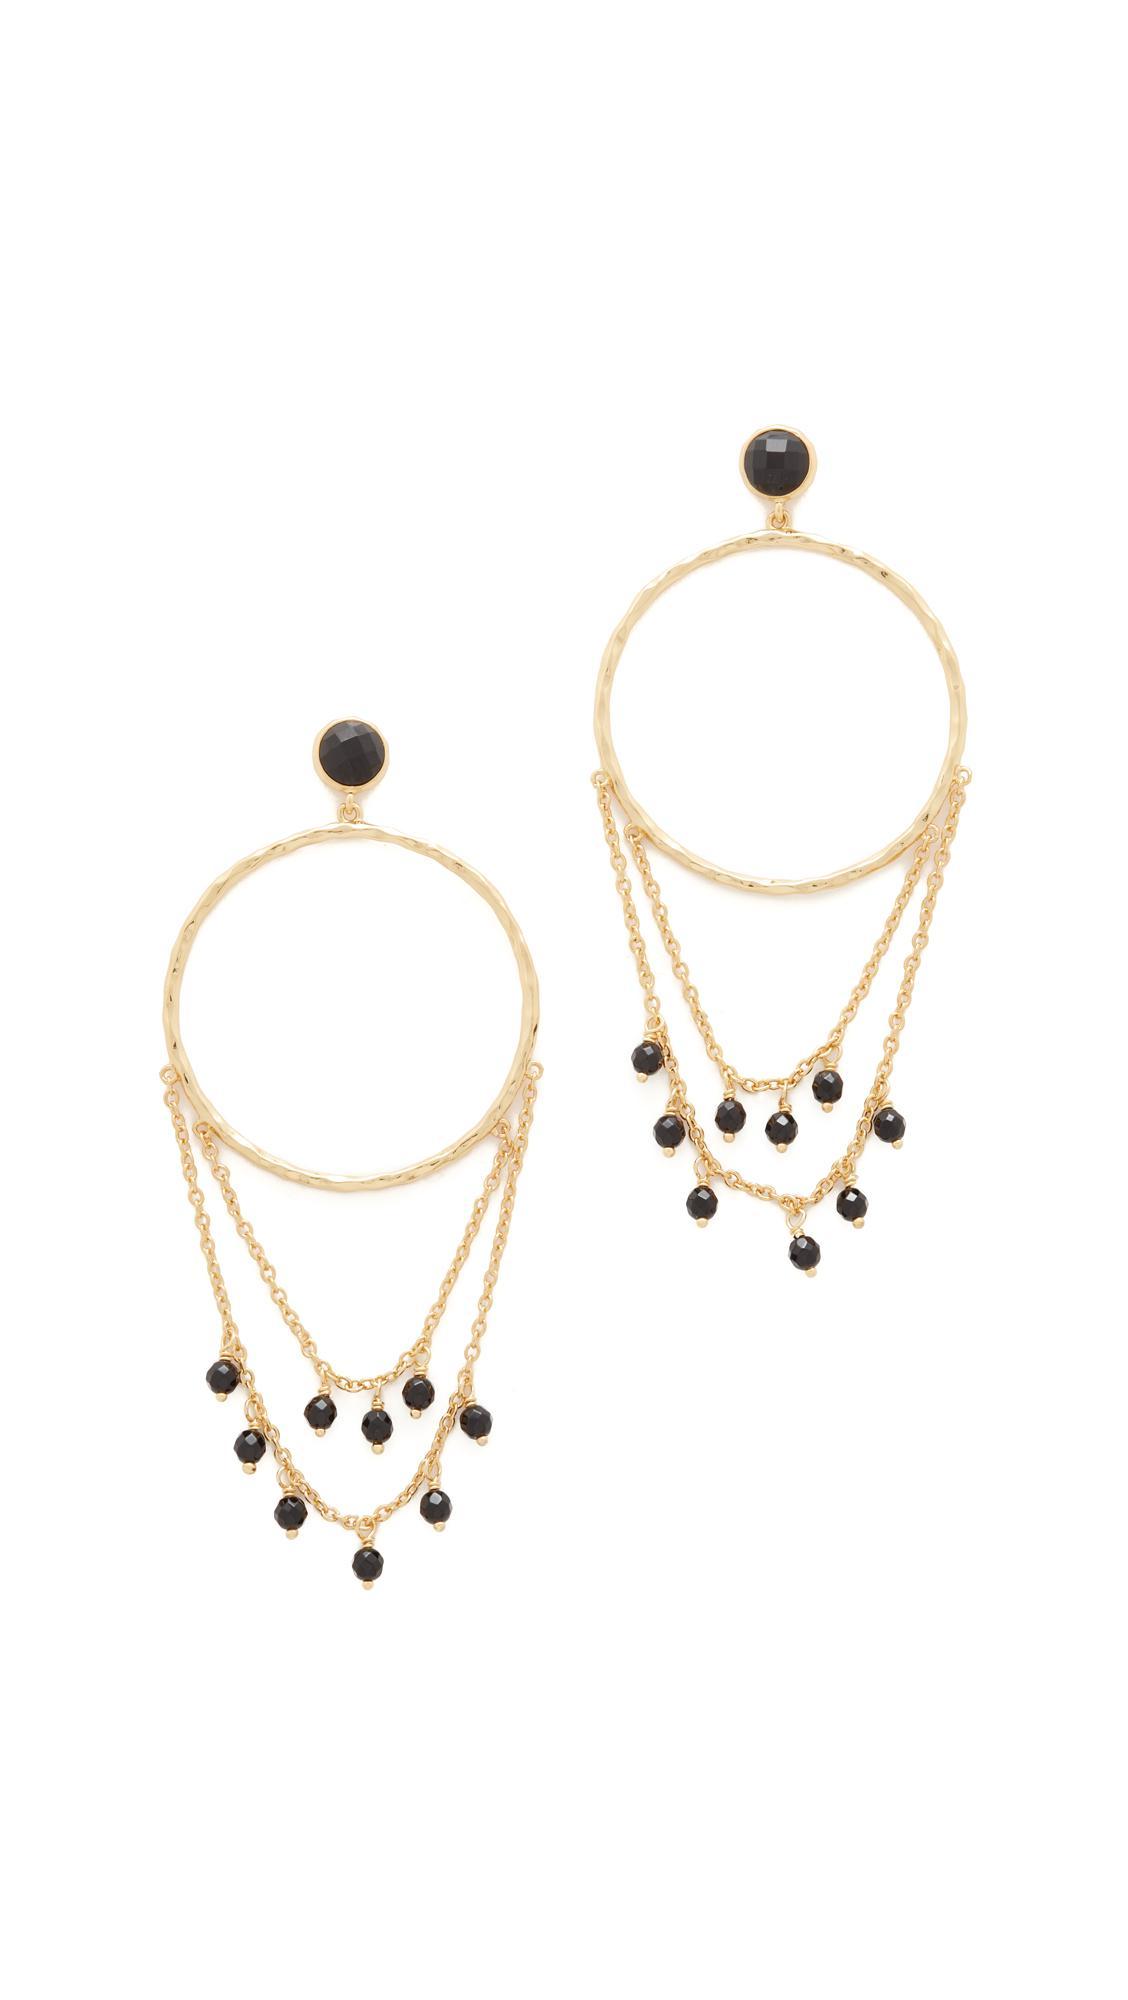 Gorjana Sol Drape Hoop Earrings in Metallic Gold QPu2OEanI